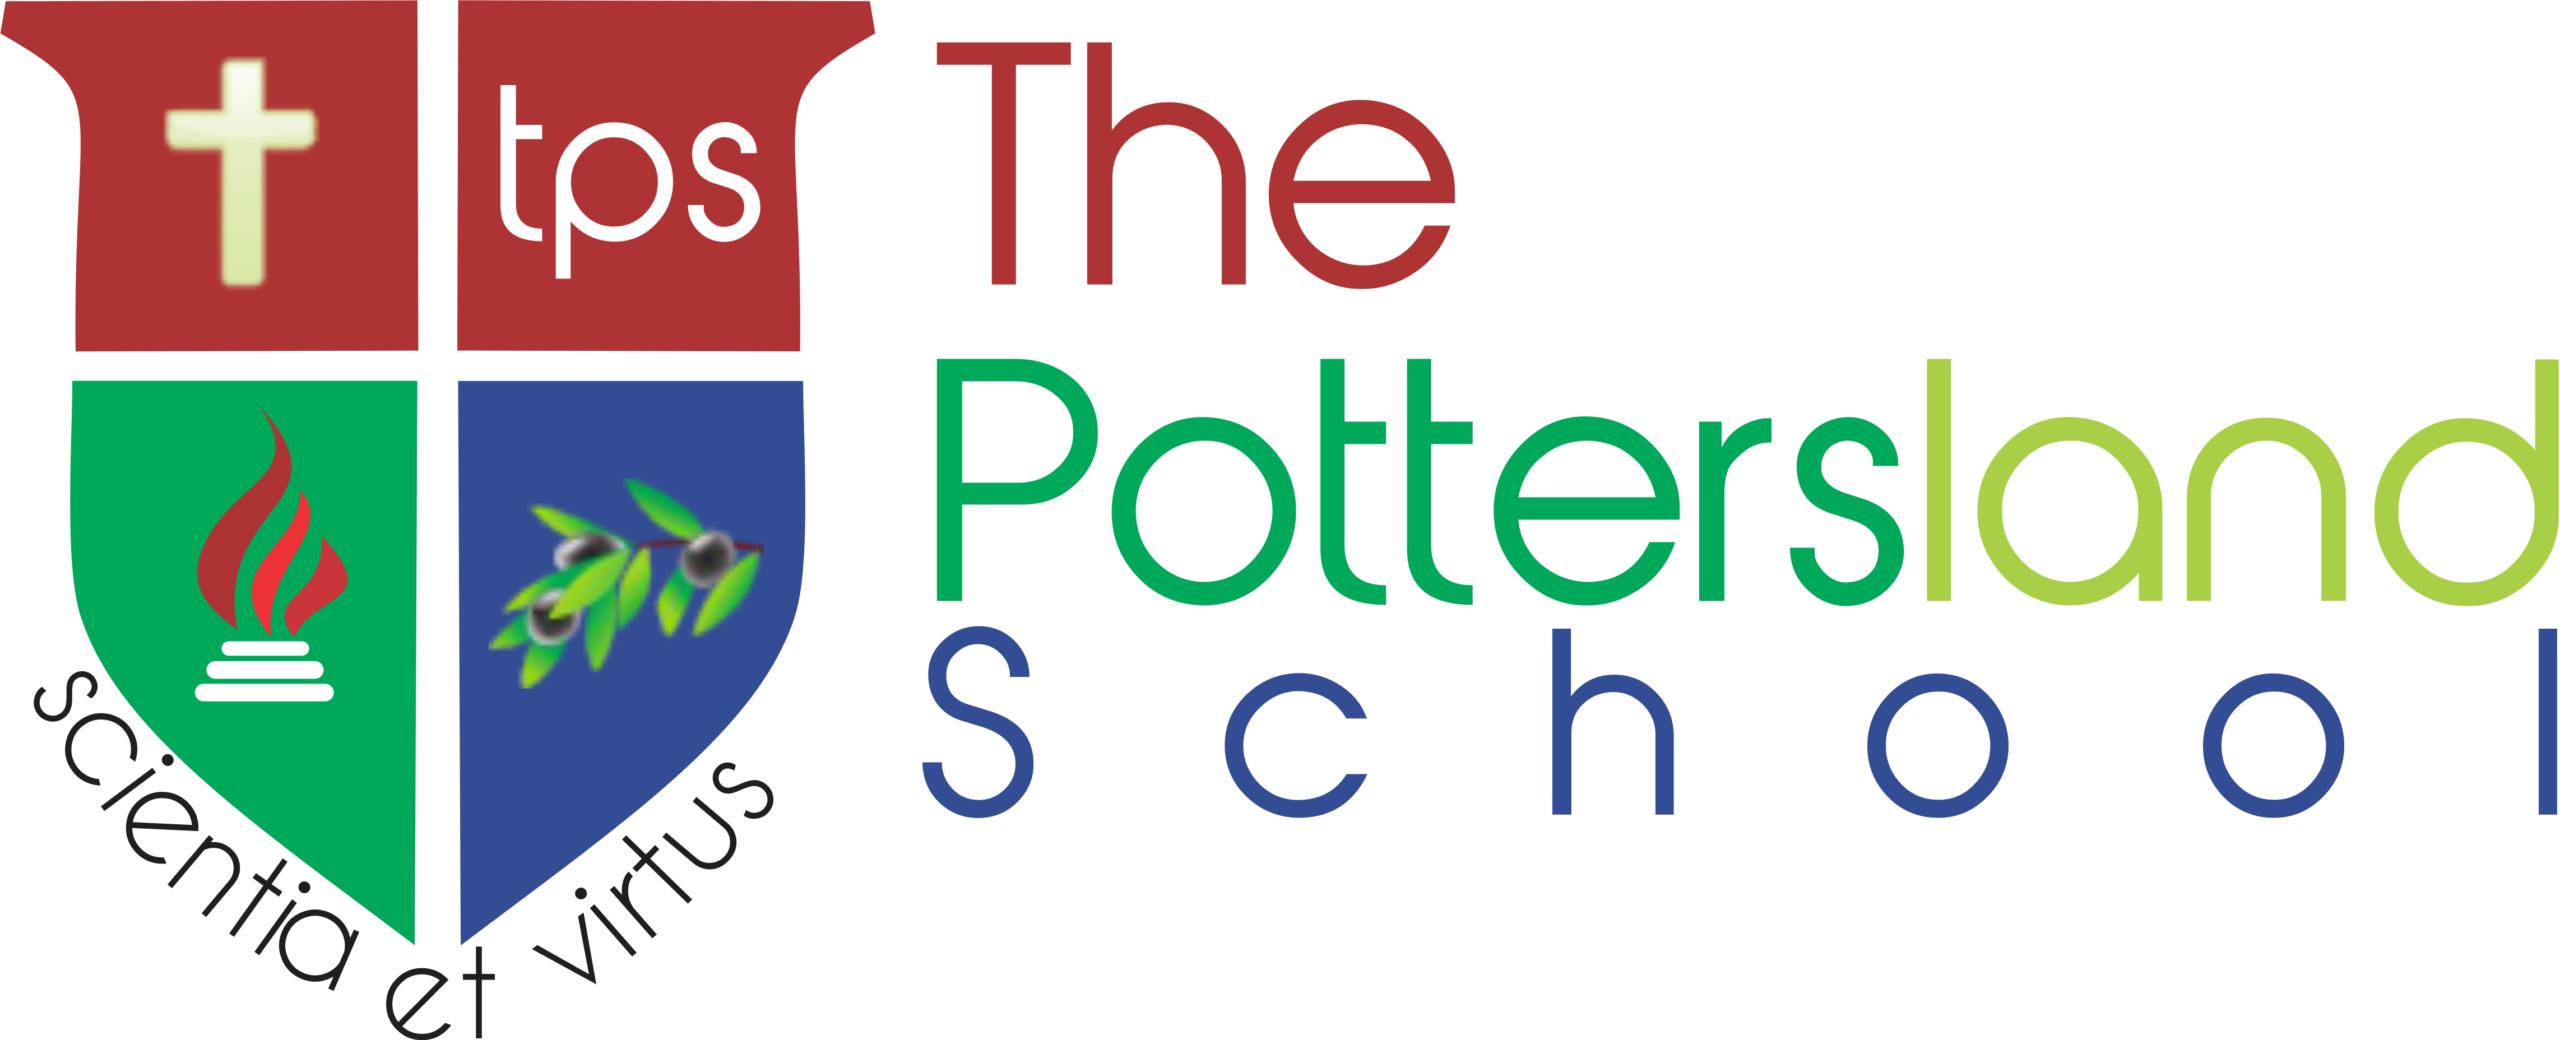 The pottersland school